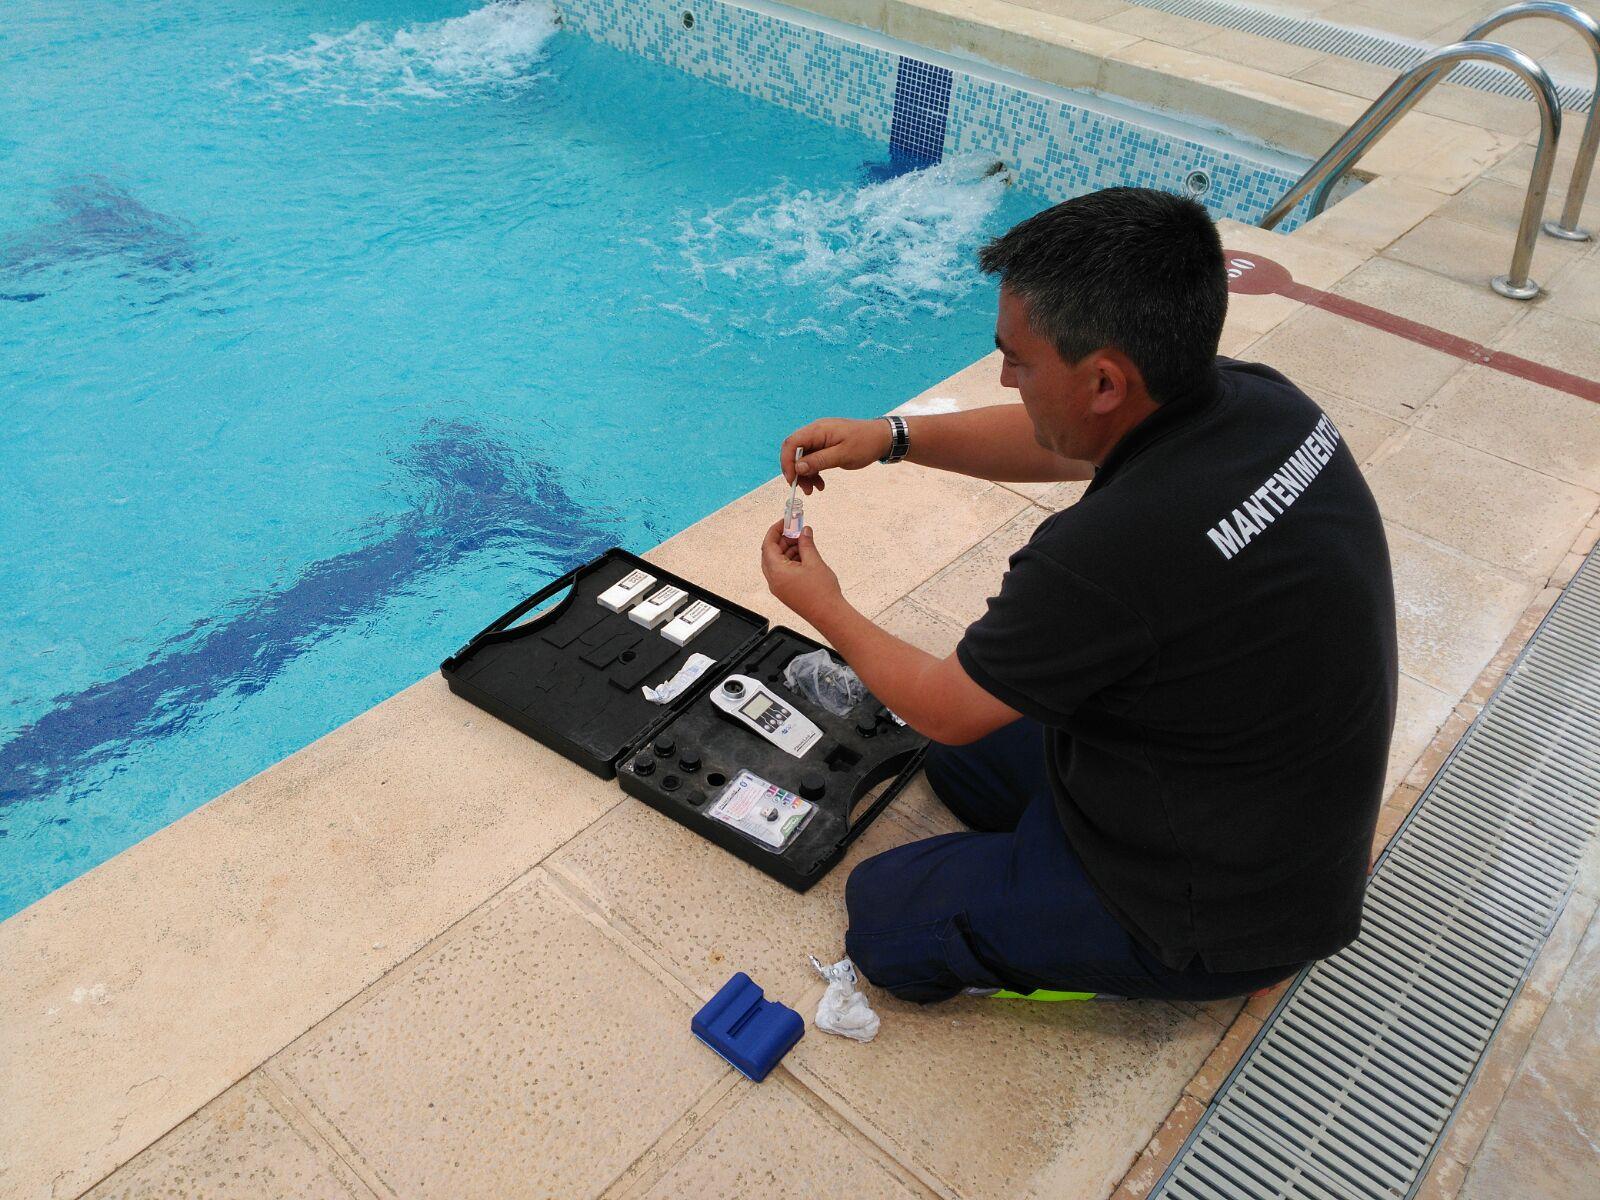 Las primeras piscinas abren en alerta naranja diario for Piscina municipal albacete